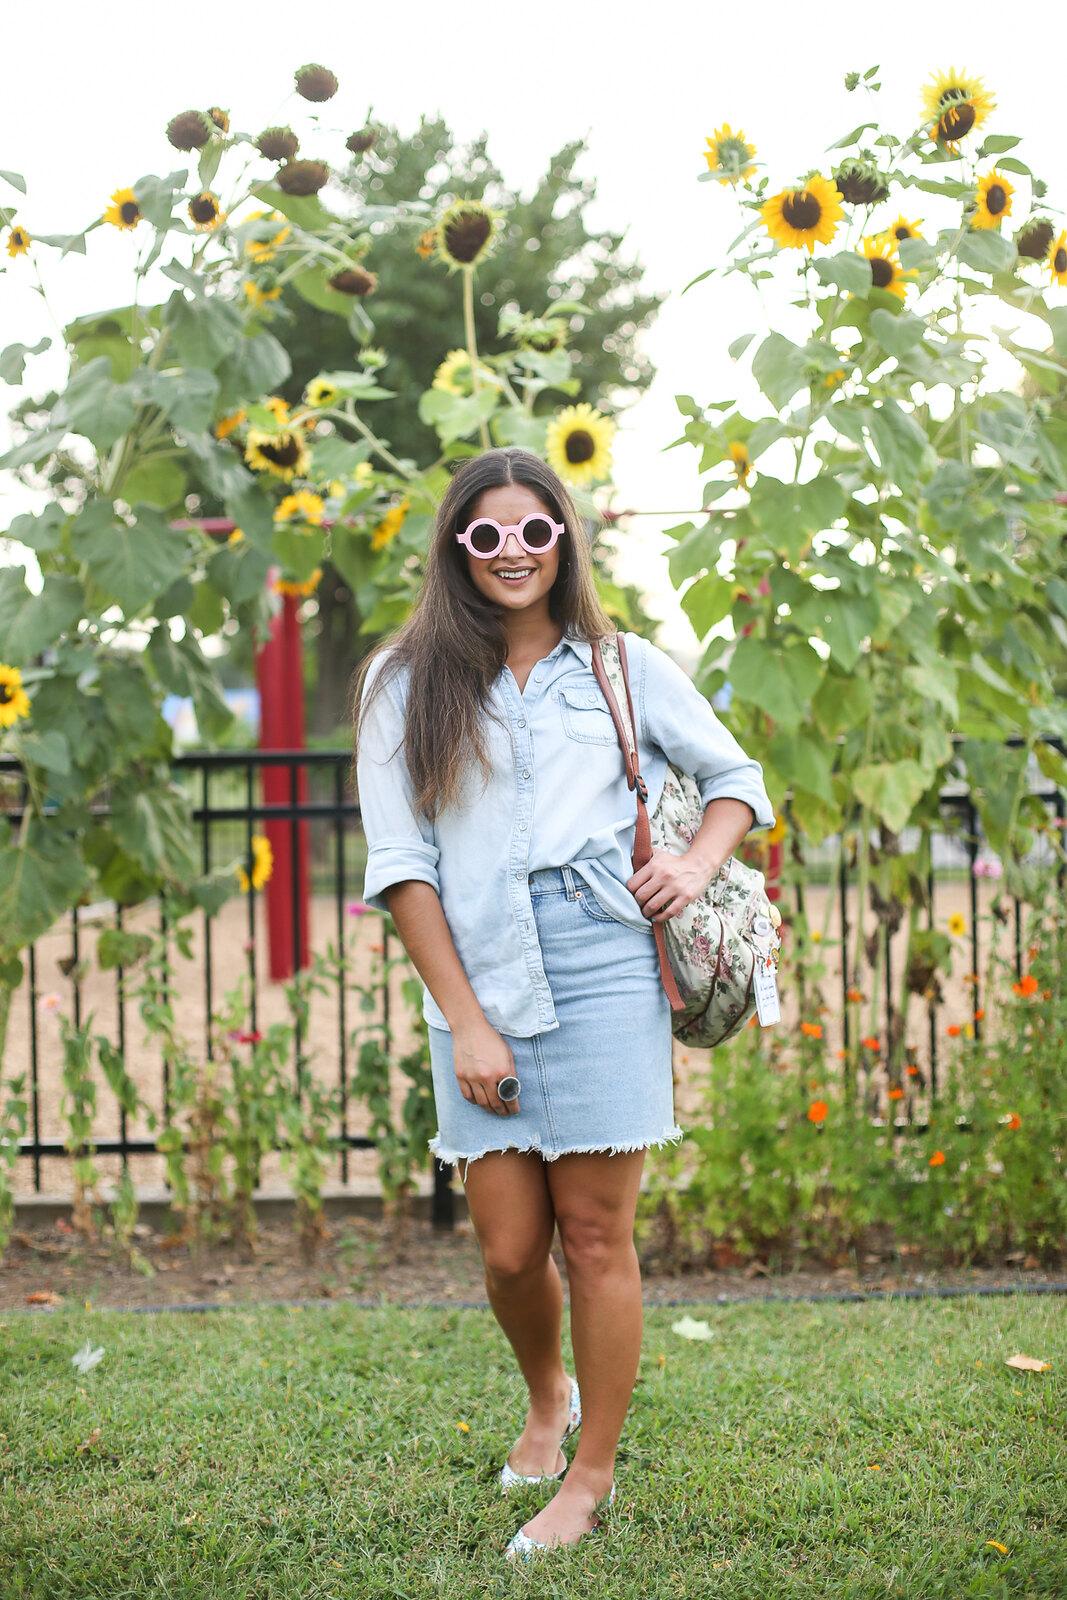 Priya the Blog, Nashville fashion blog, Nashville fashion blogger, Nashville style blog, Nashville style blogger, chambray Summer outfit, Sunflower tuxedo, Canadian tuxedo for Summer, Sunflower outfit shoot, denim on denim for Summer, floral backpack